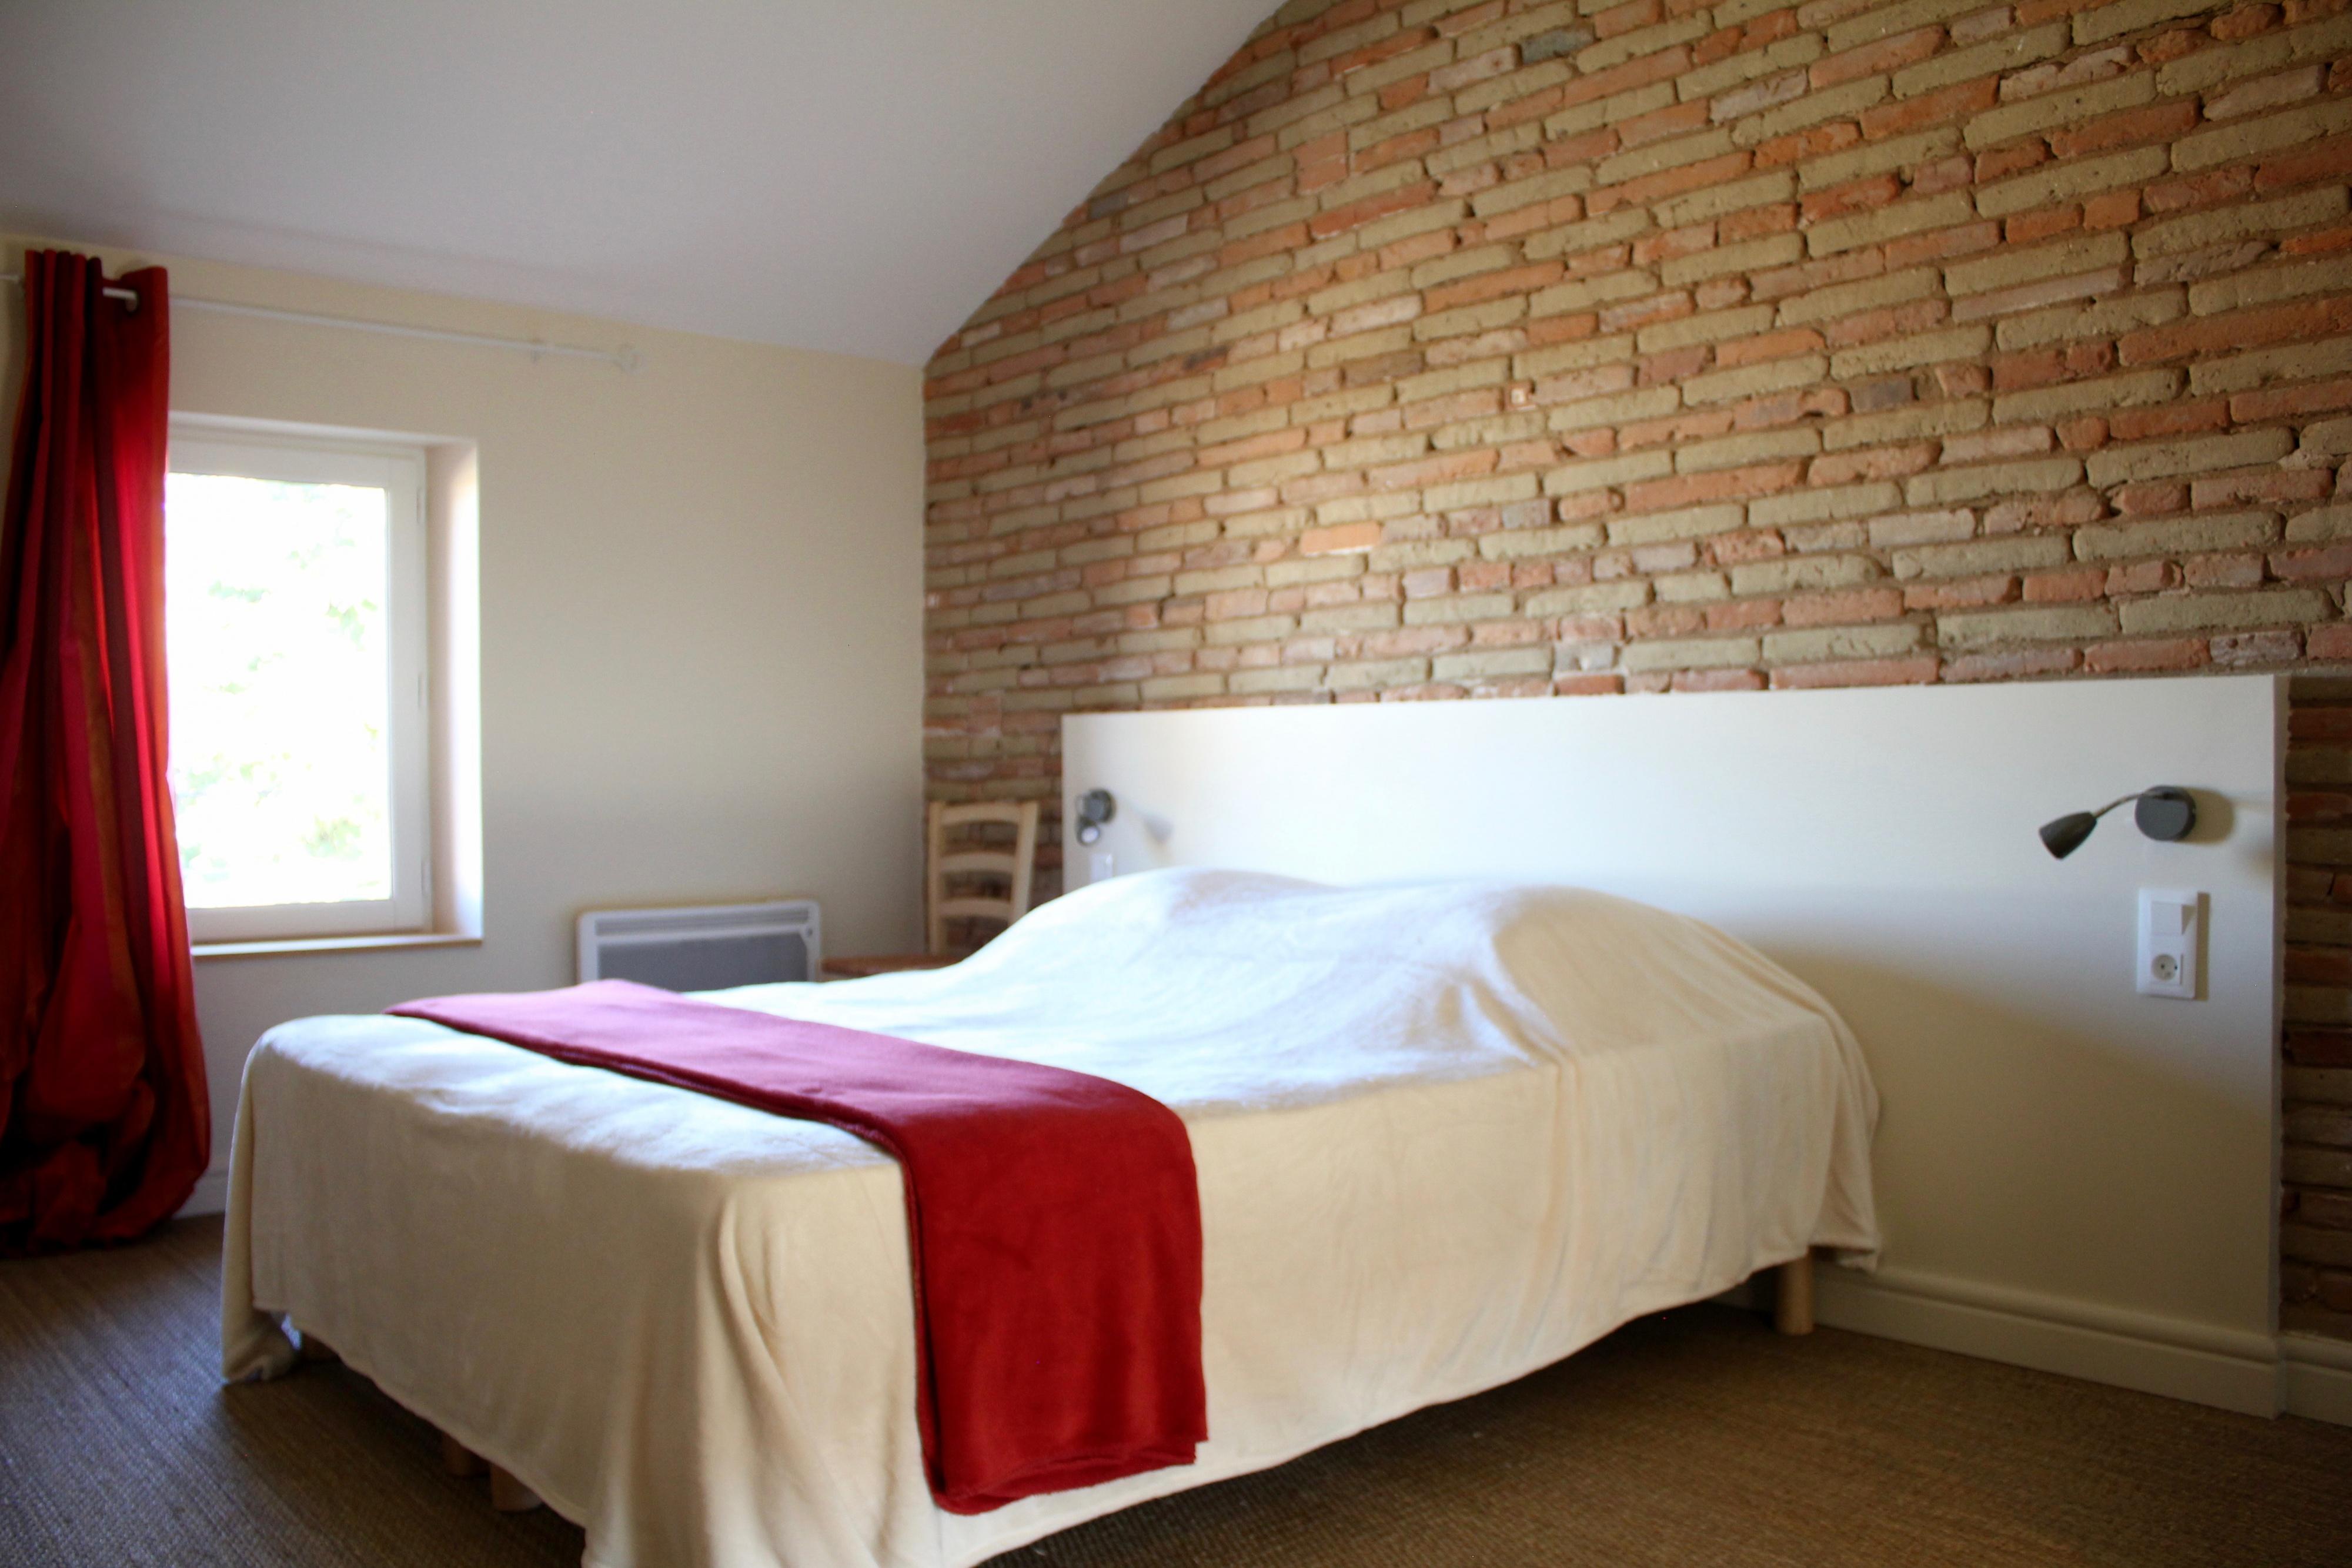 chambre-gite-de-groupe-manzana-golden-tarn-et-garonne-receptions-chateau-lavalade